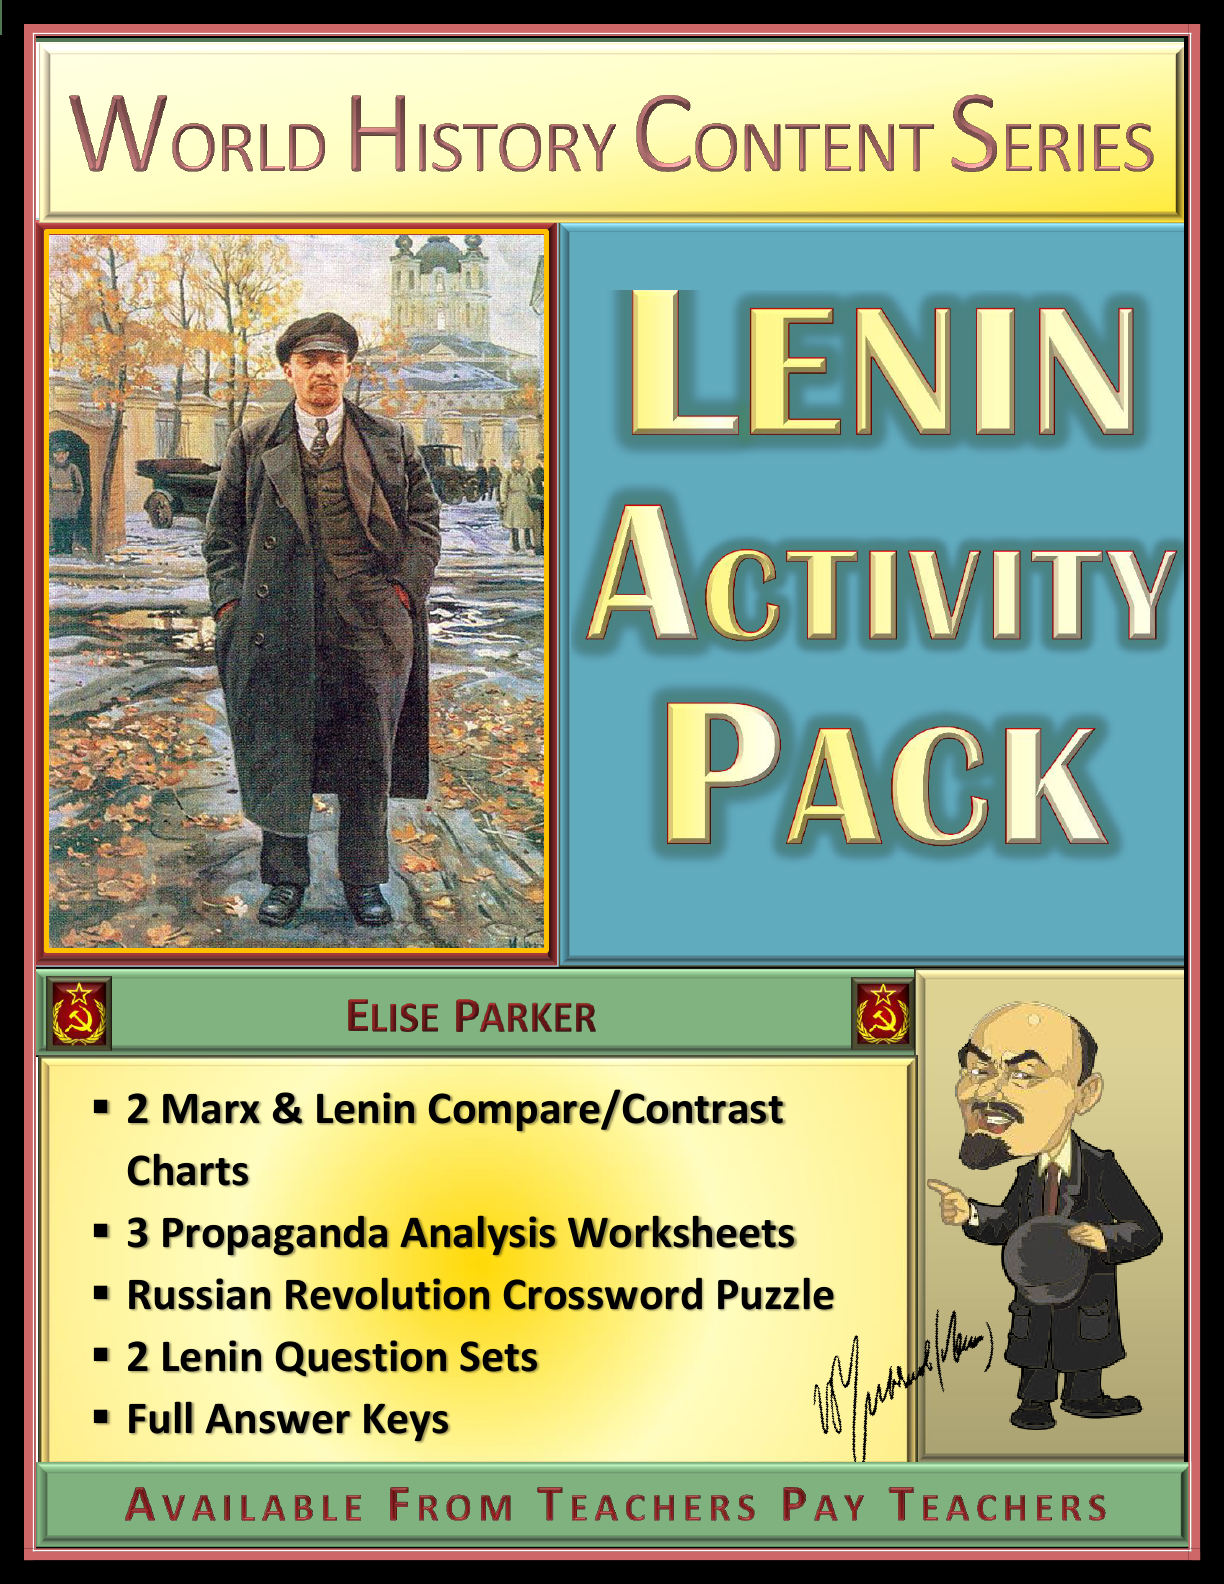 Lenin activity pack charts propaganda worksheets question sets lenin activity pack charts propaganda worksheets question sets puzzle toneelgroepblik Gallery